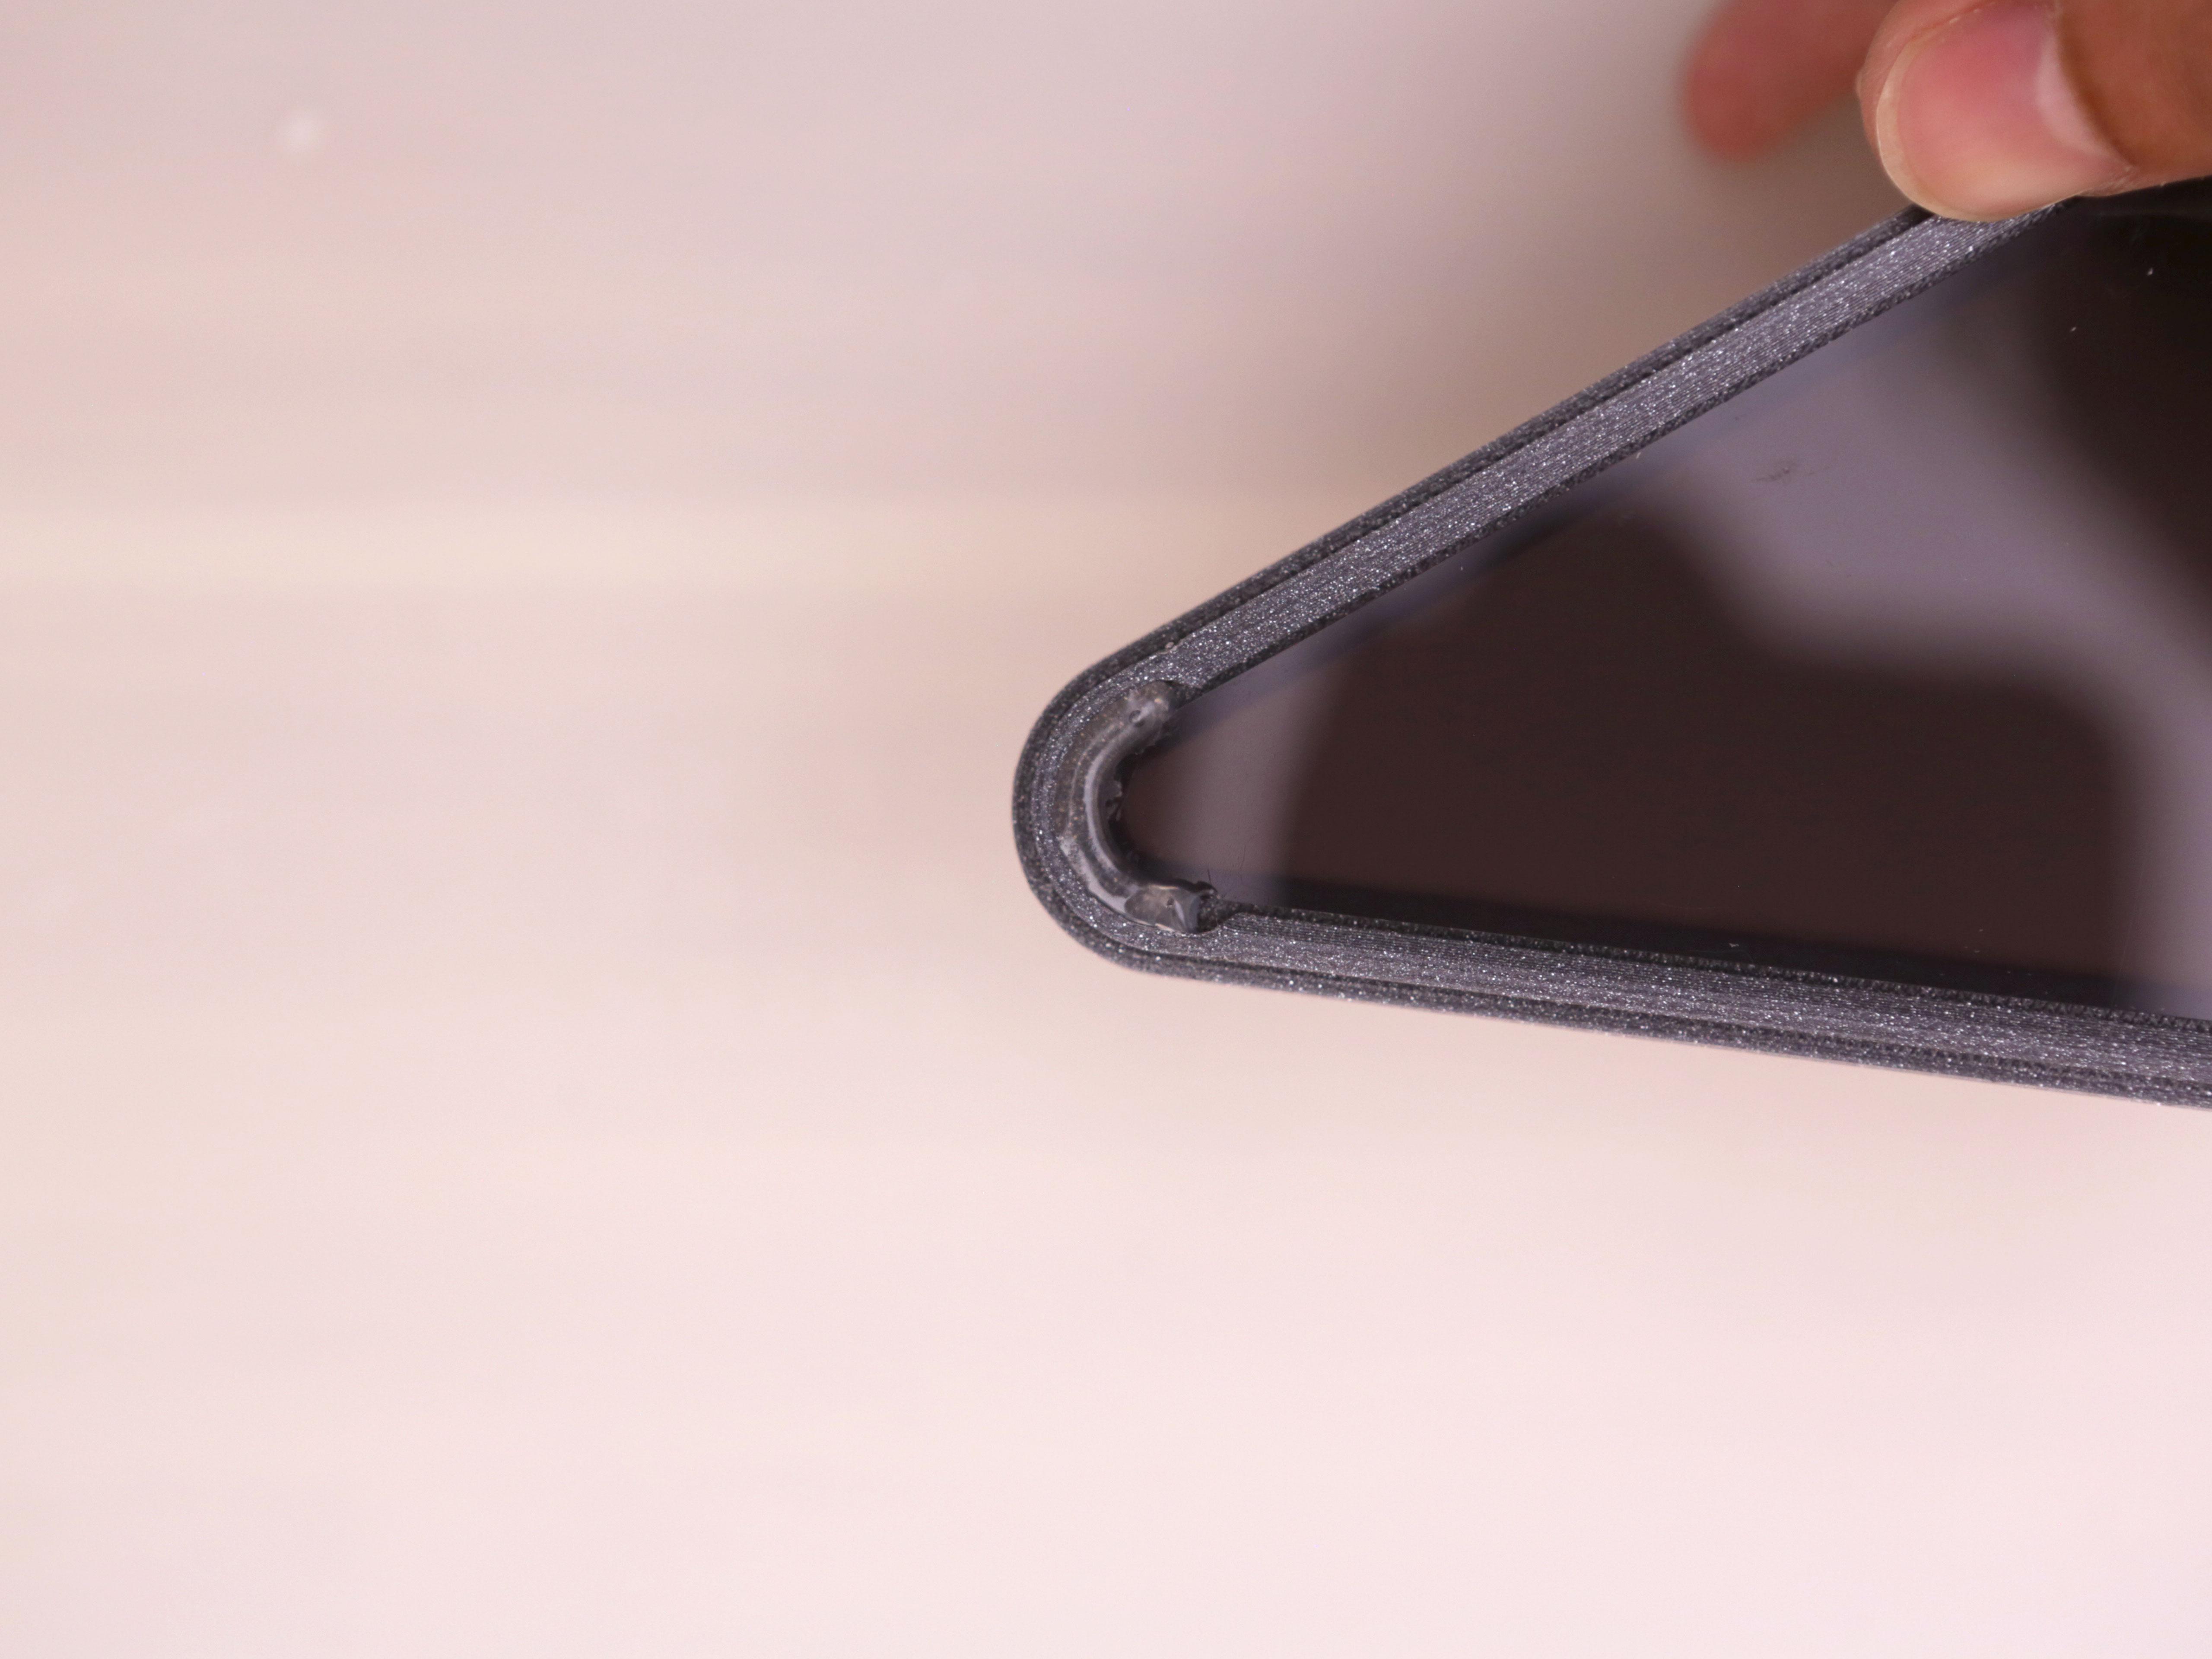 3d_printing_head-cover-glue-tip.jpg